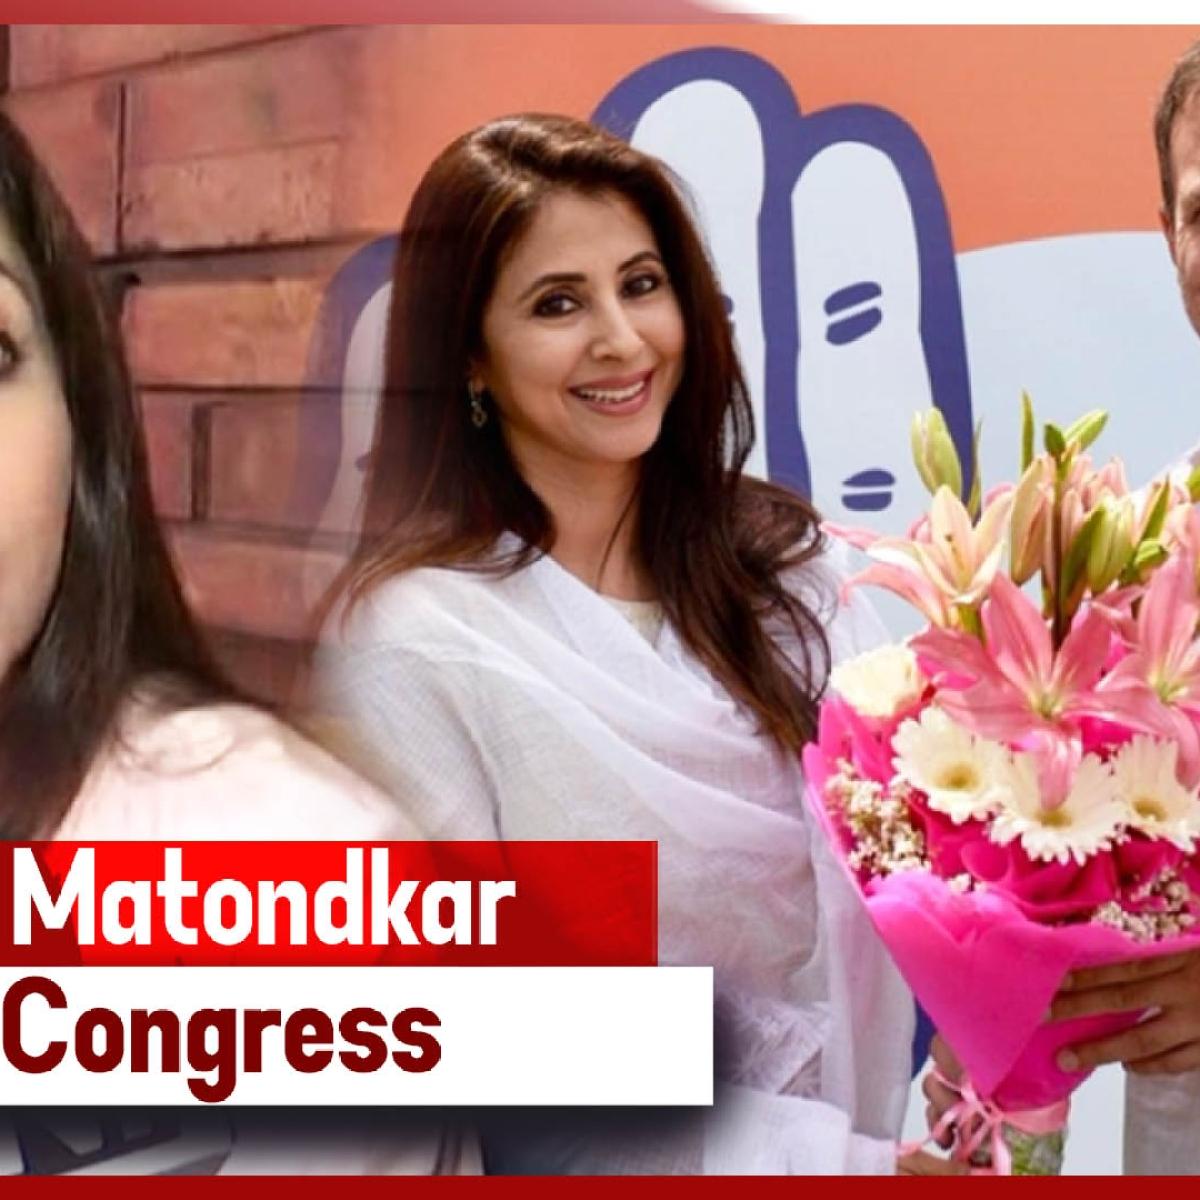 Urmila Matondkar Quits Congress, Cites Petty In-House Politics As Reason Behind Resignation